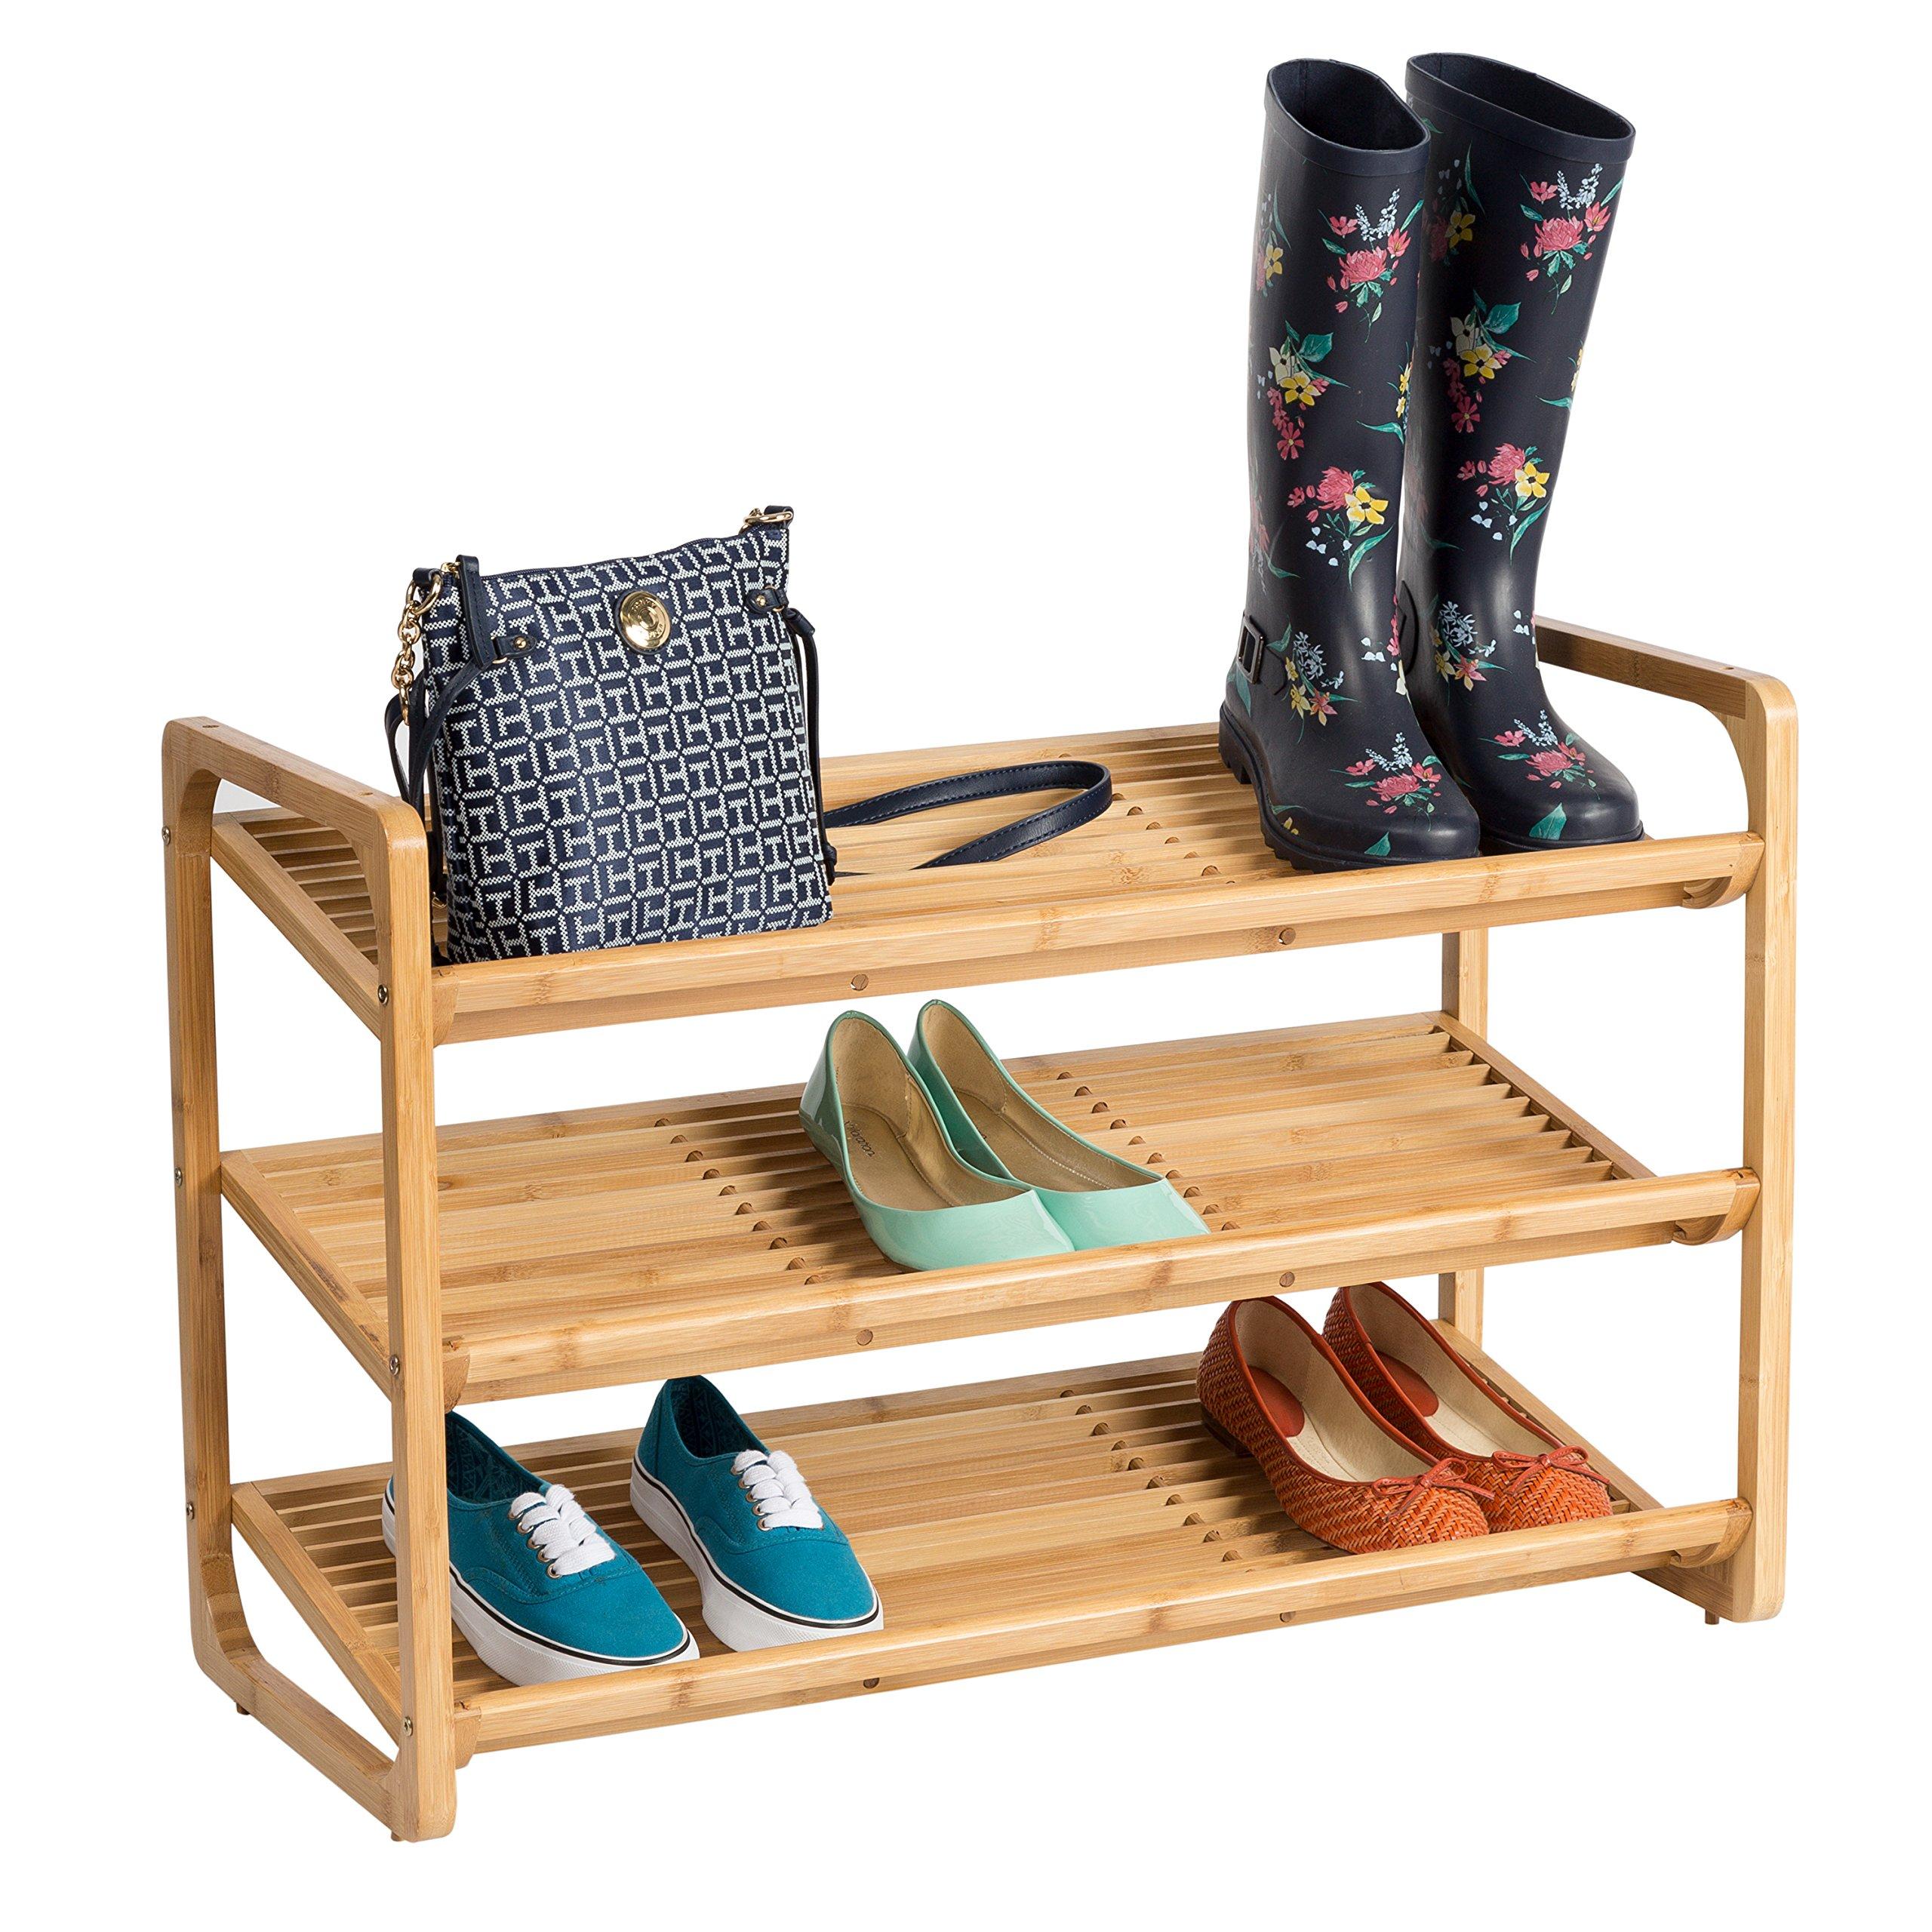 Honey-Can-Do SHO-01599 Bamboo 3-Tier Shoe Shelf by Honey-Can-Do (Image #1)